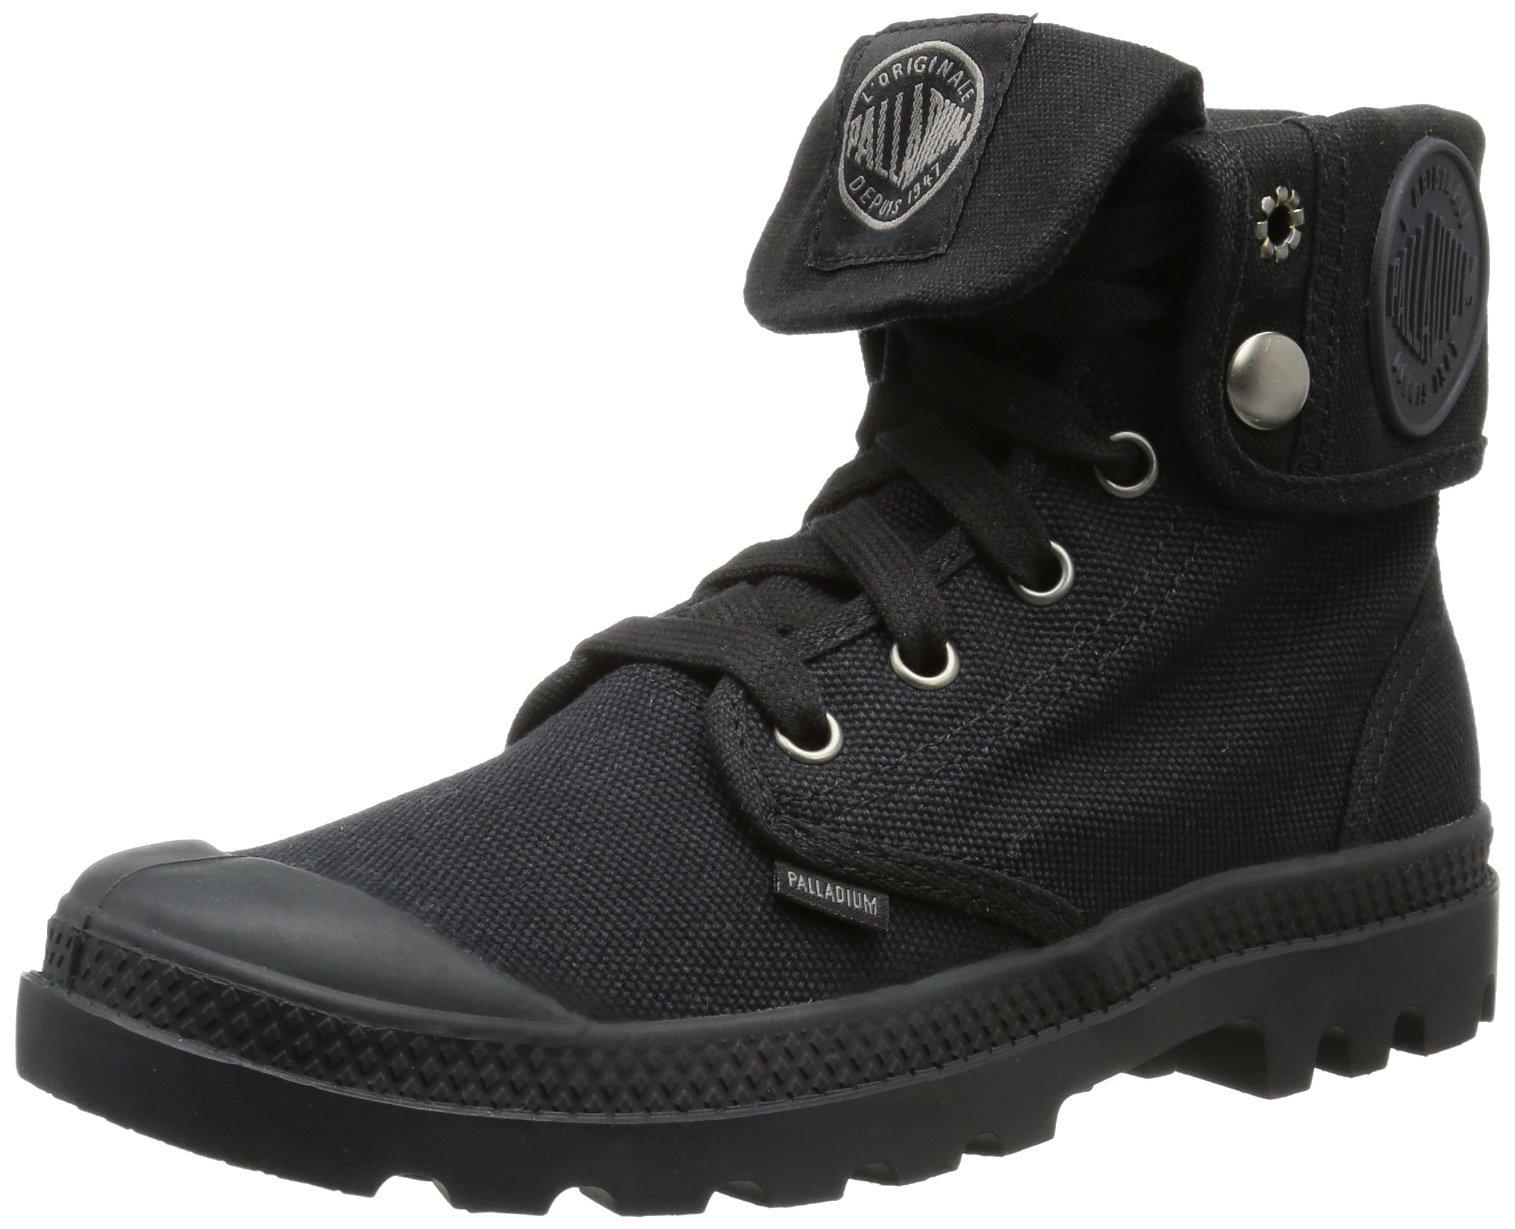 Palladium Women's Baggy Combat Boot, Black, 6 M US